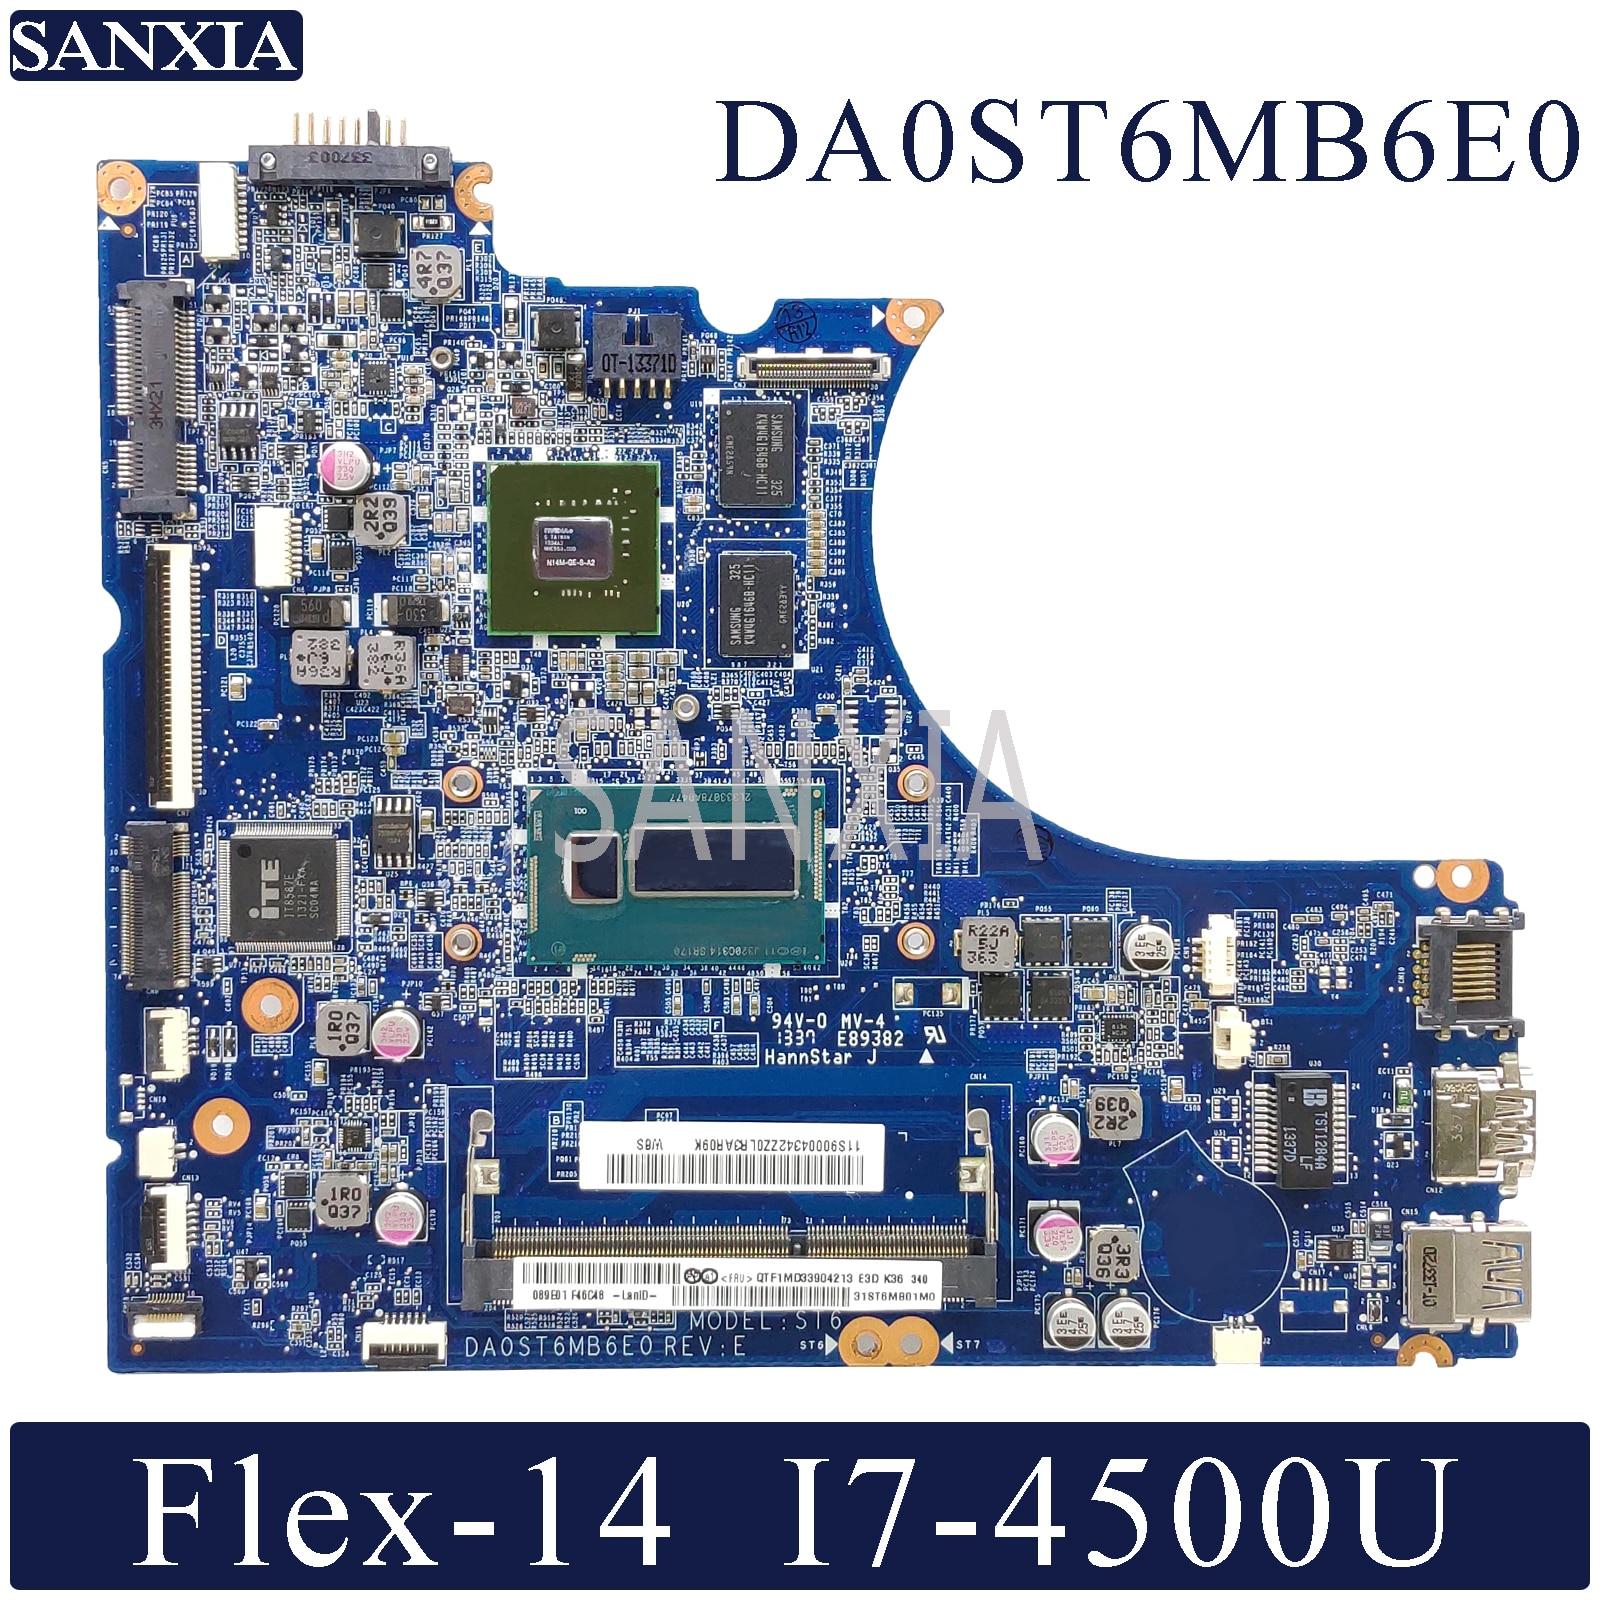 KEFU DA0ST6MB6E0 Laptop Motherboard For Lenovo Flex-14 Original Mainboard I7-4500U GT720M